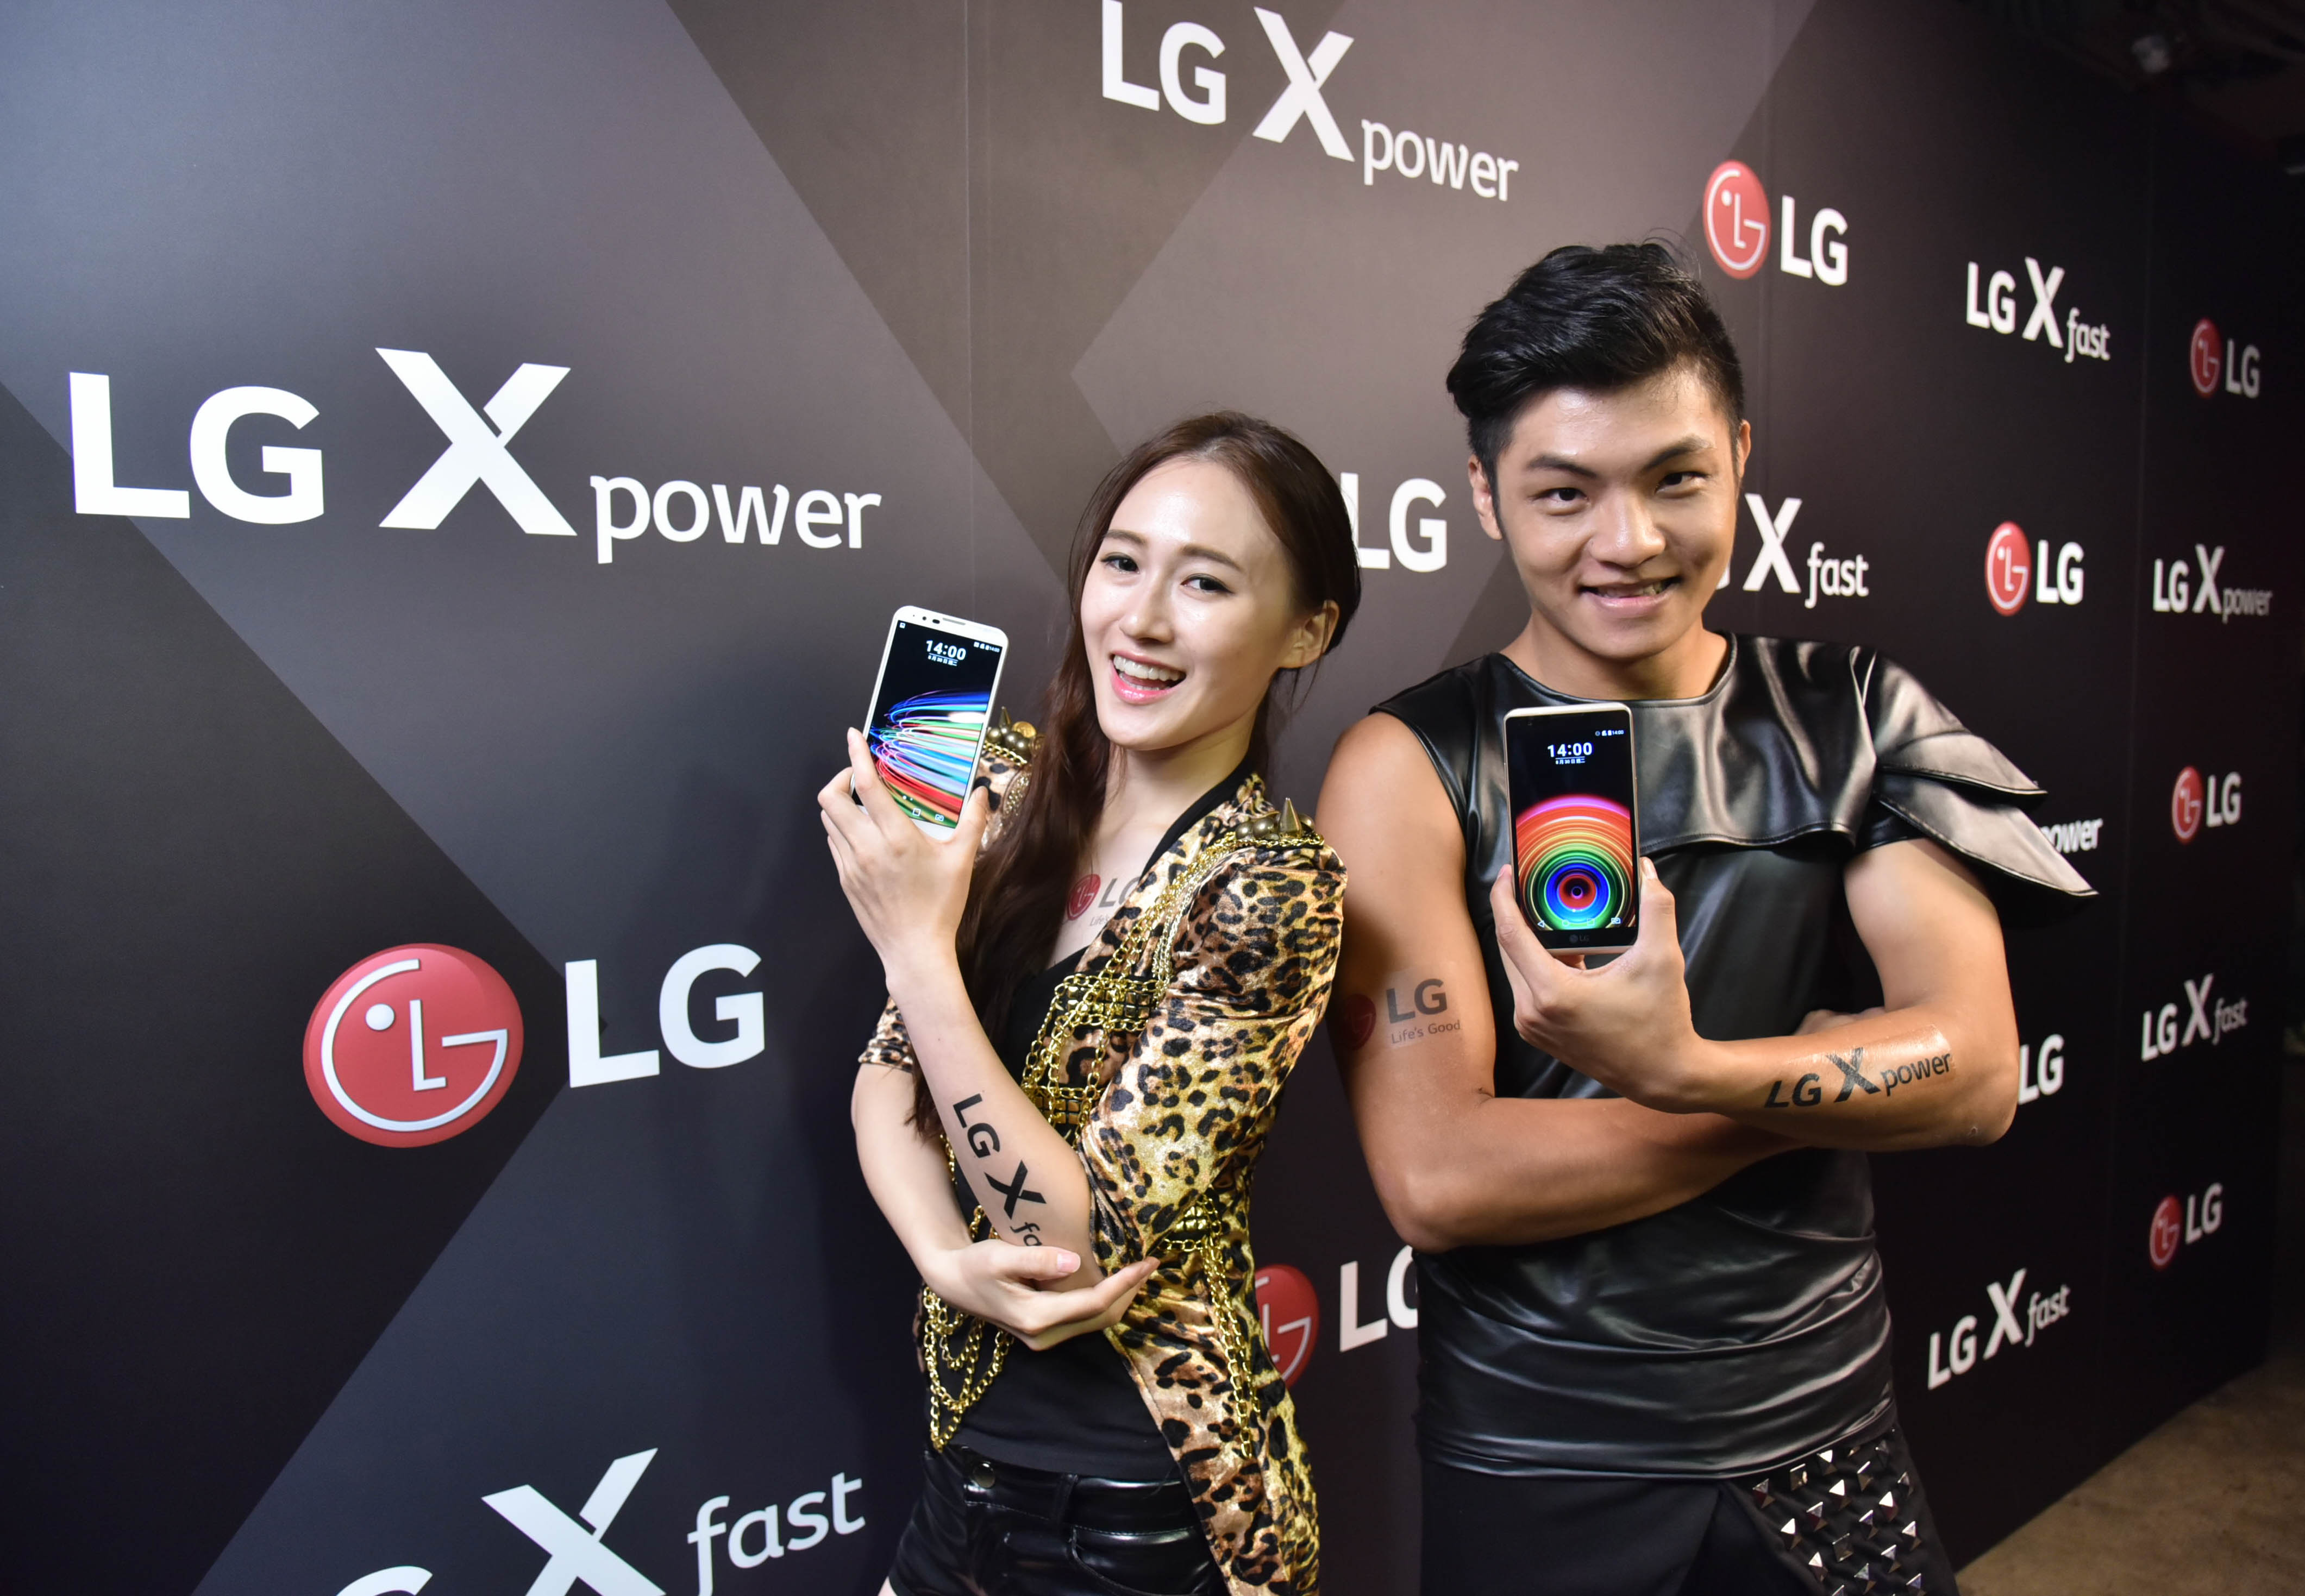 LG X Series上市 揮灑個性魅力風格 X戰力造就獨特體驗